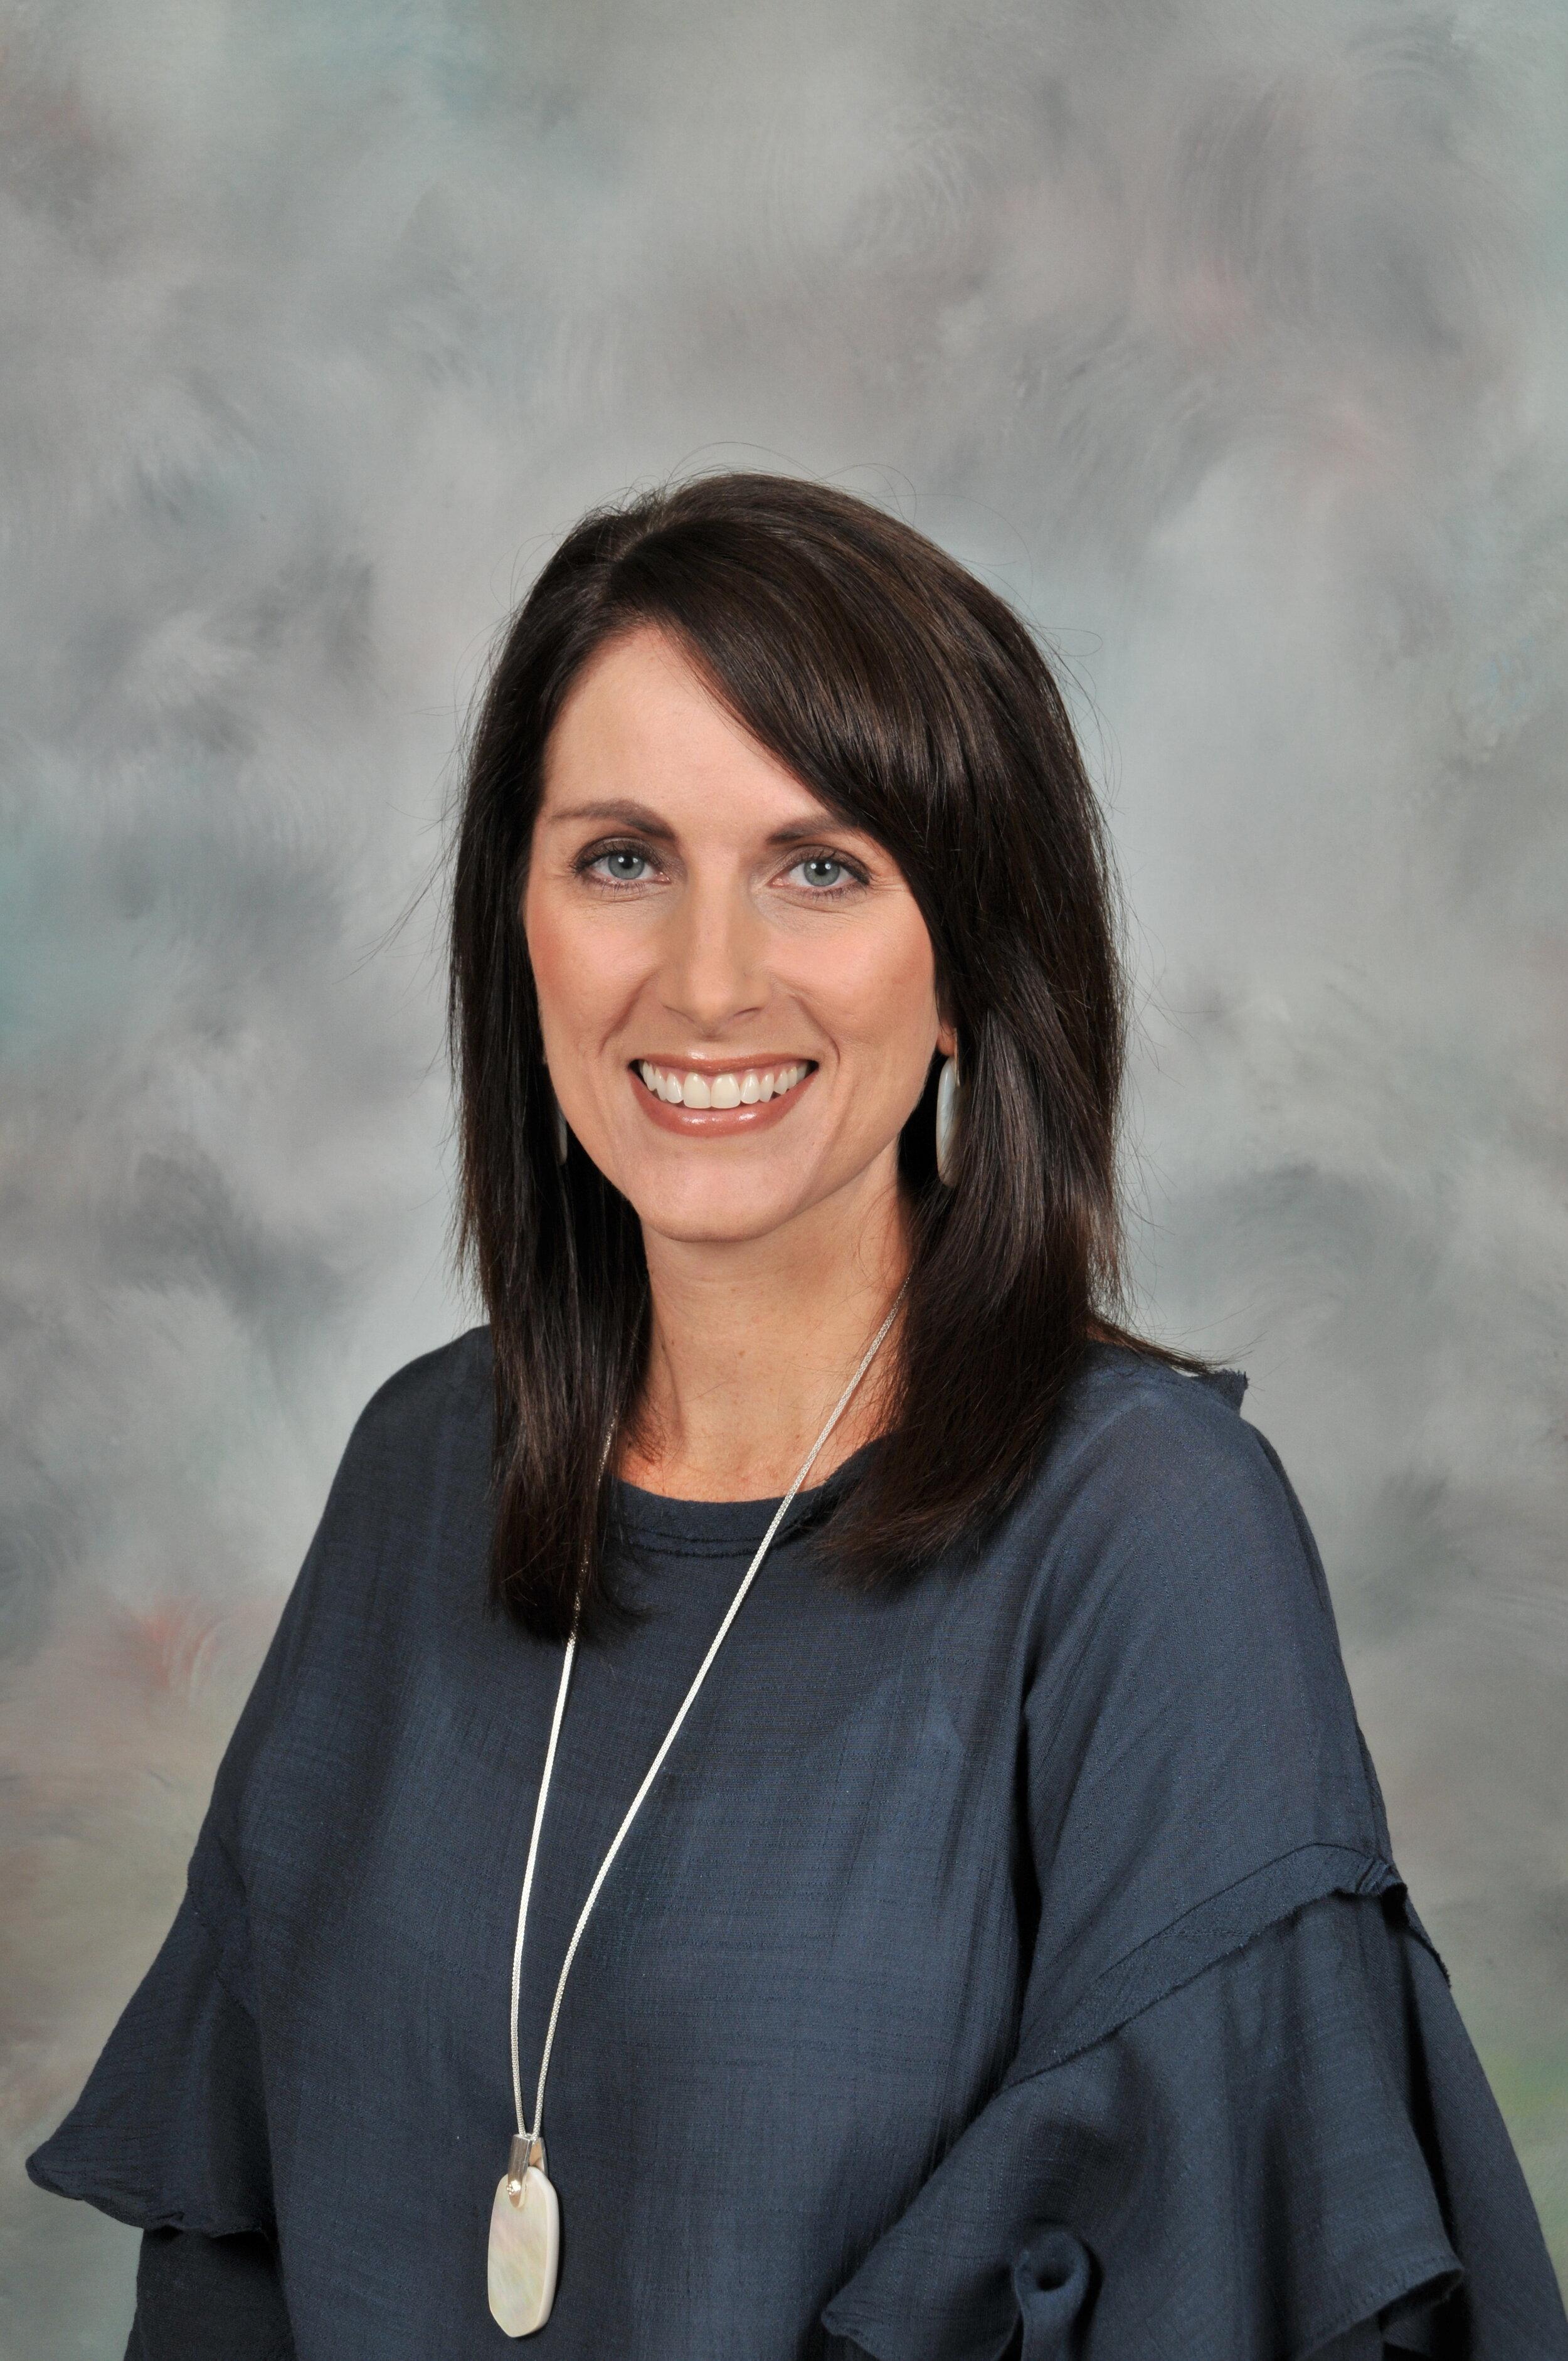 Sarah Medlin, Administrator